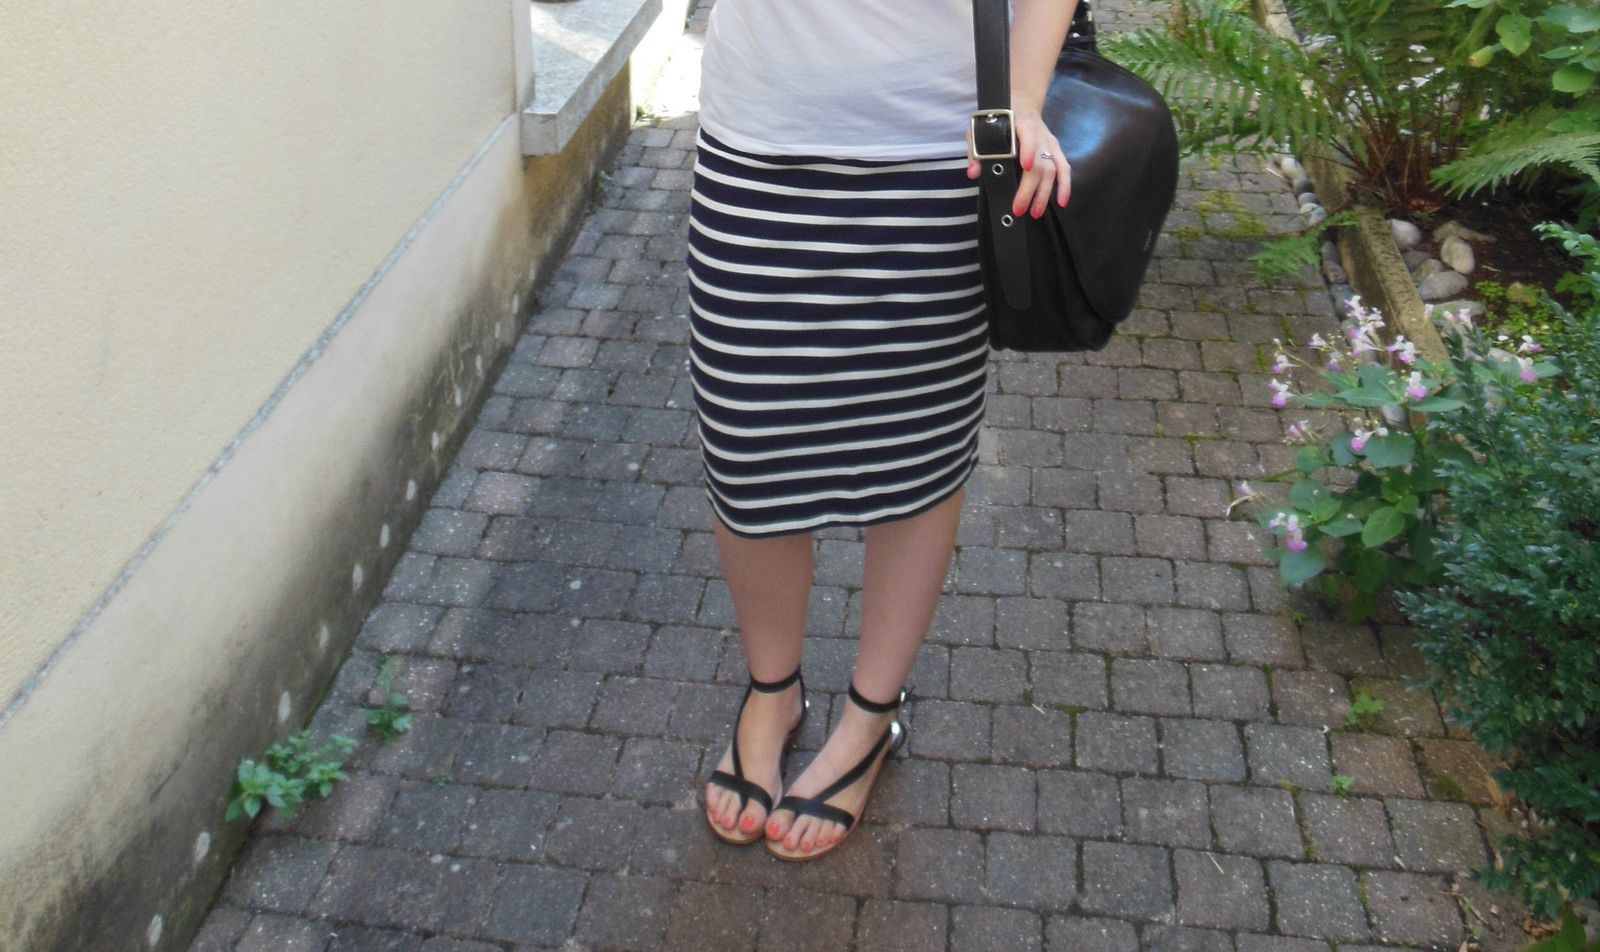 Tee-shirt - H&M // Jupe - Gap // Sandales - Zara // Sac - Coach